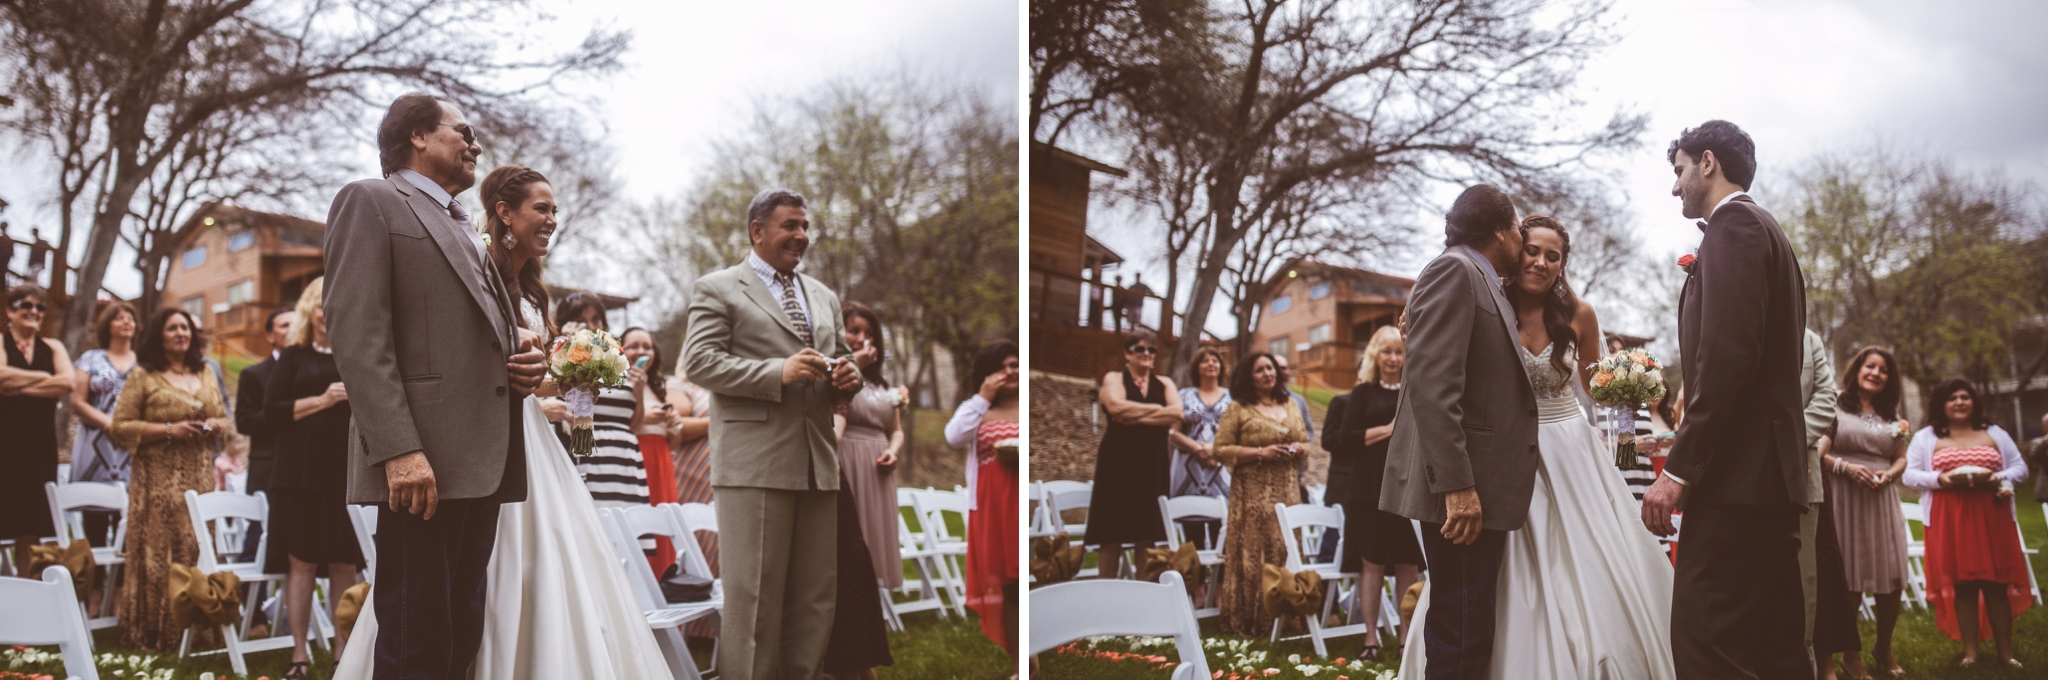 Milltown-Historic-Distric-Wedding-New-Braunfels-012.jpg